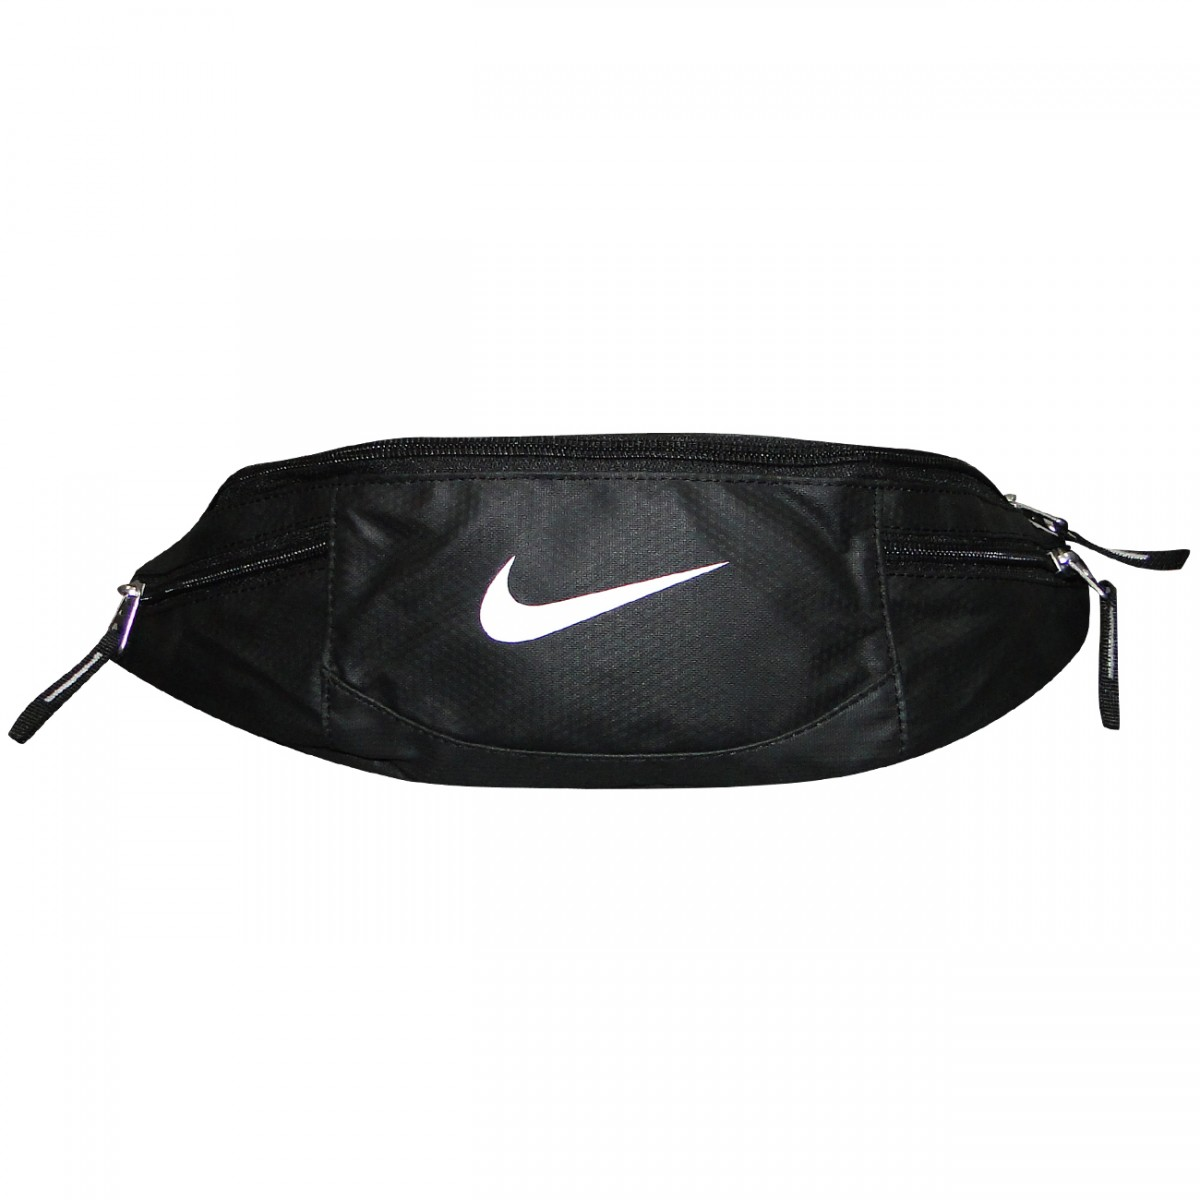 9999ca5cf Pochete Nike ref.4601 BA4601 067 - Preto/Branco - Chuteira Nike ...